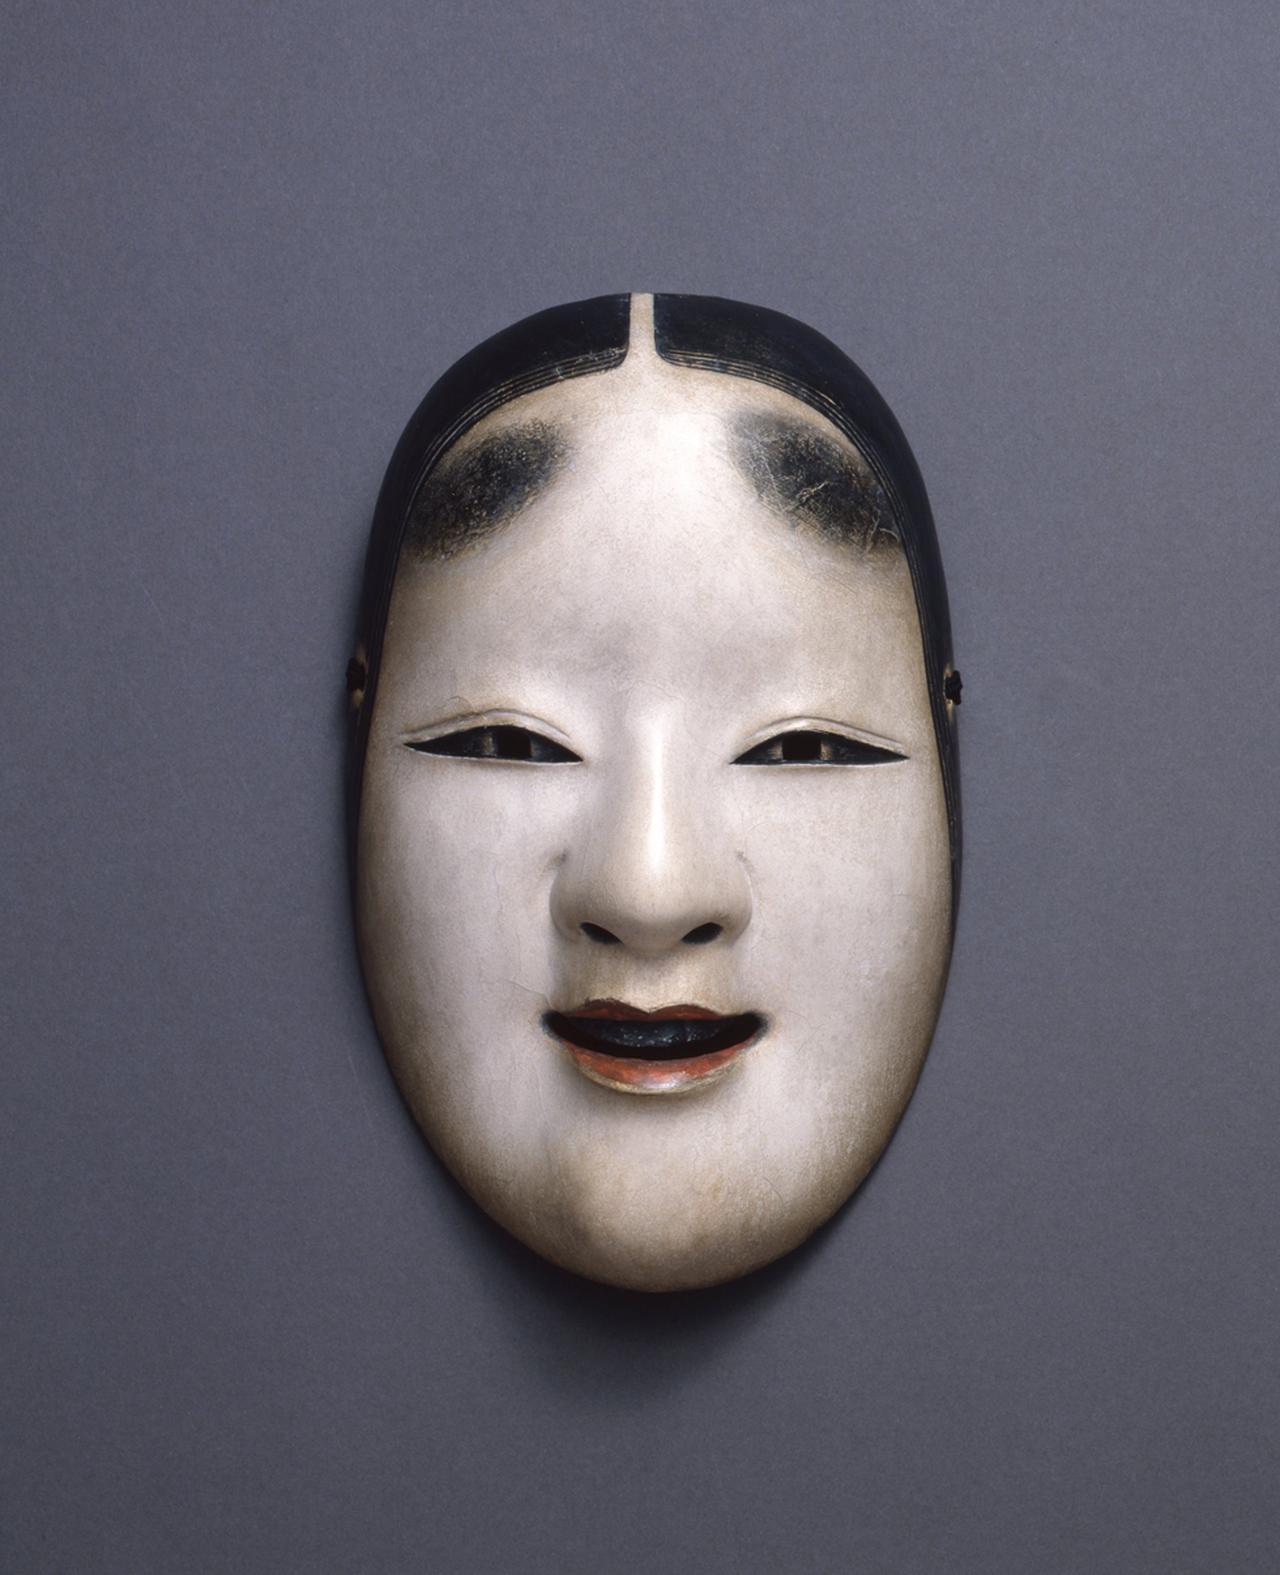 Images : 2番目の画像 - 「能面に誘われてーー。 能楽師がキュレーションする 幽玄なる能の装飾品」のアルバム - T JAPAN:The New York Times Style Magazine 公式サイト